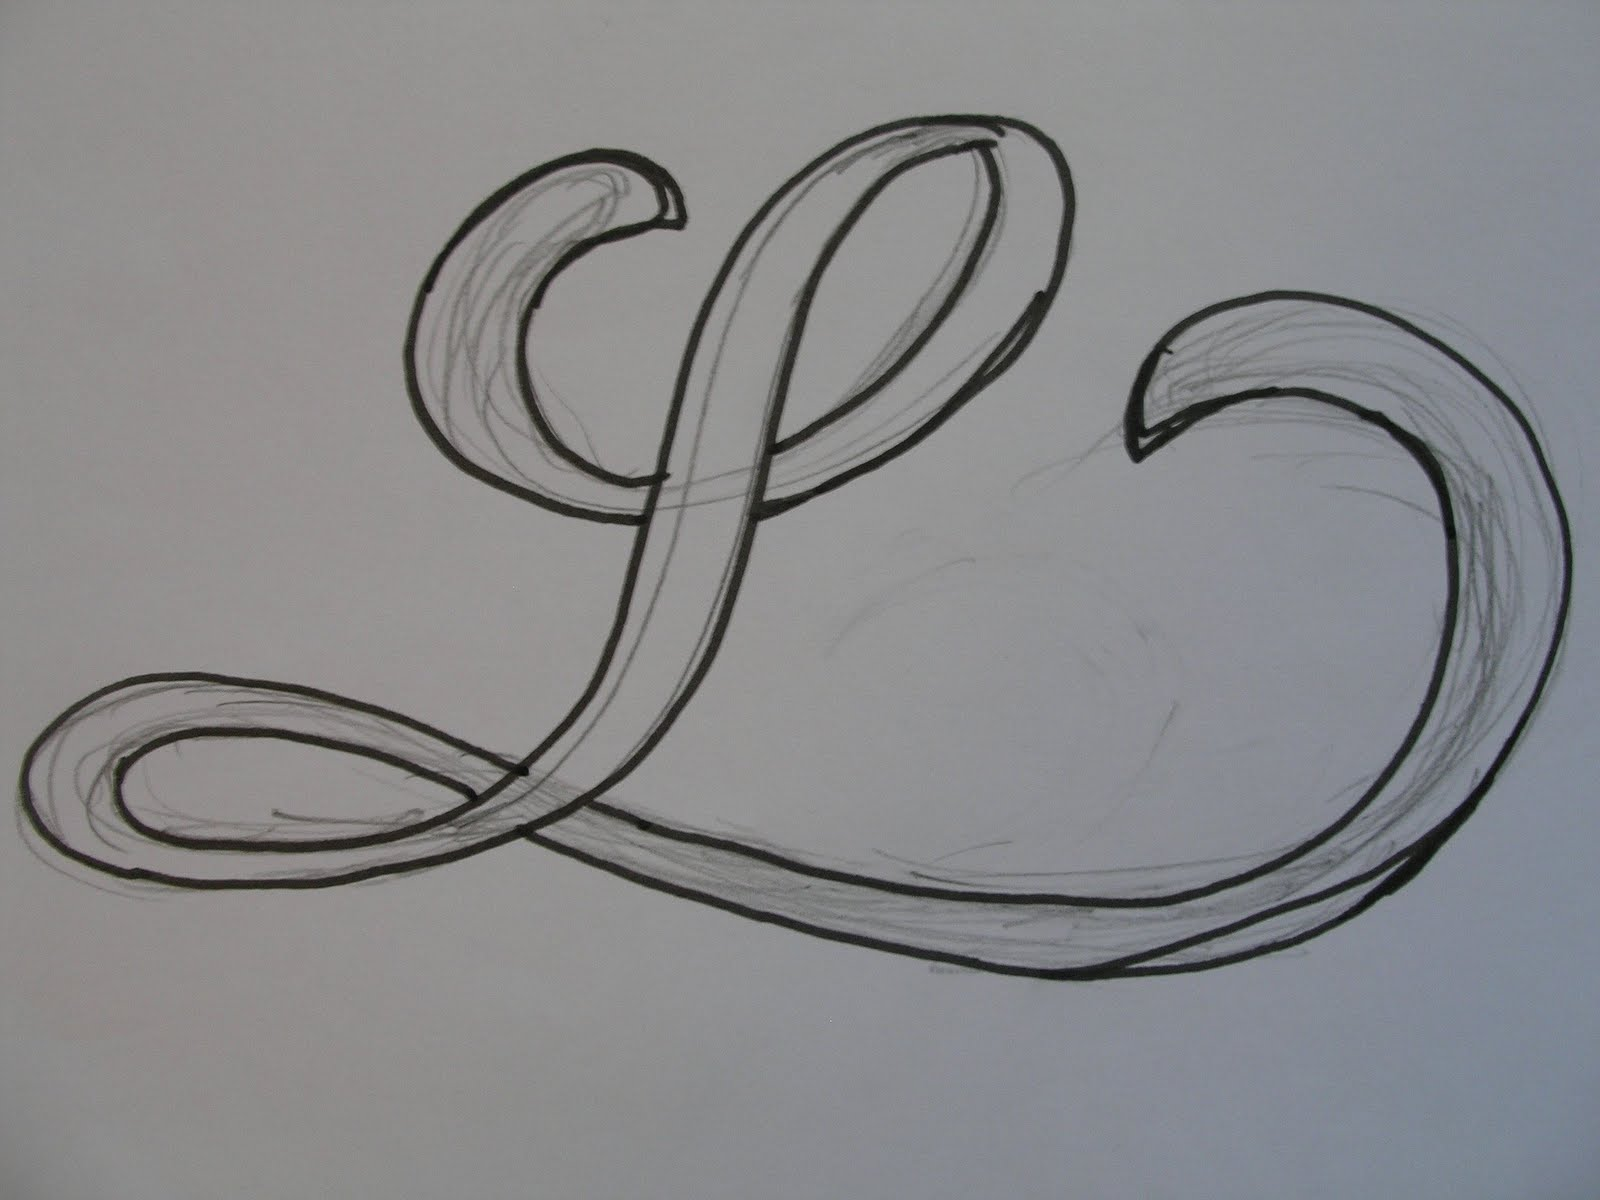 A Place To Flourish: Leaf Script - Calligraphy Flourish Friday